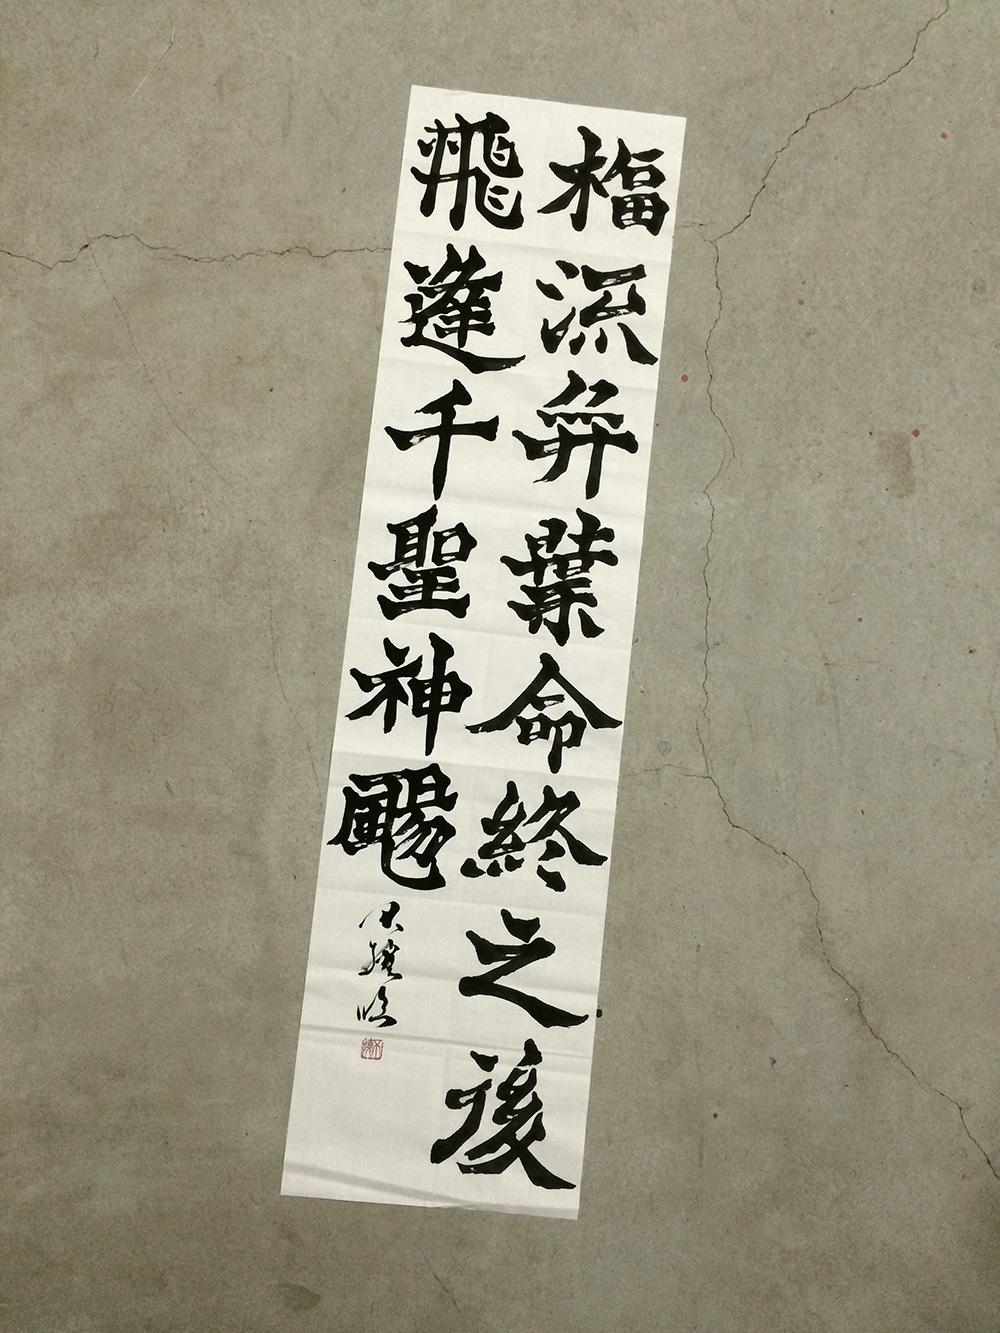 20140804_rin_gireizozoki_1.jpg